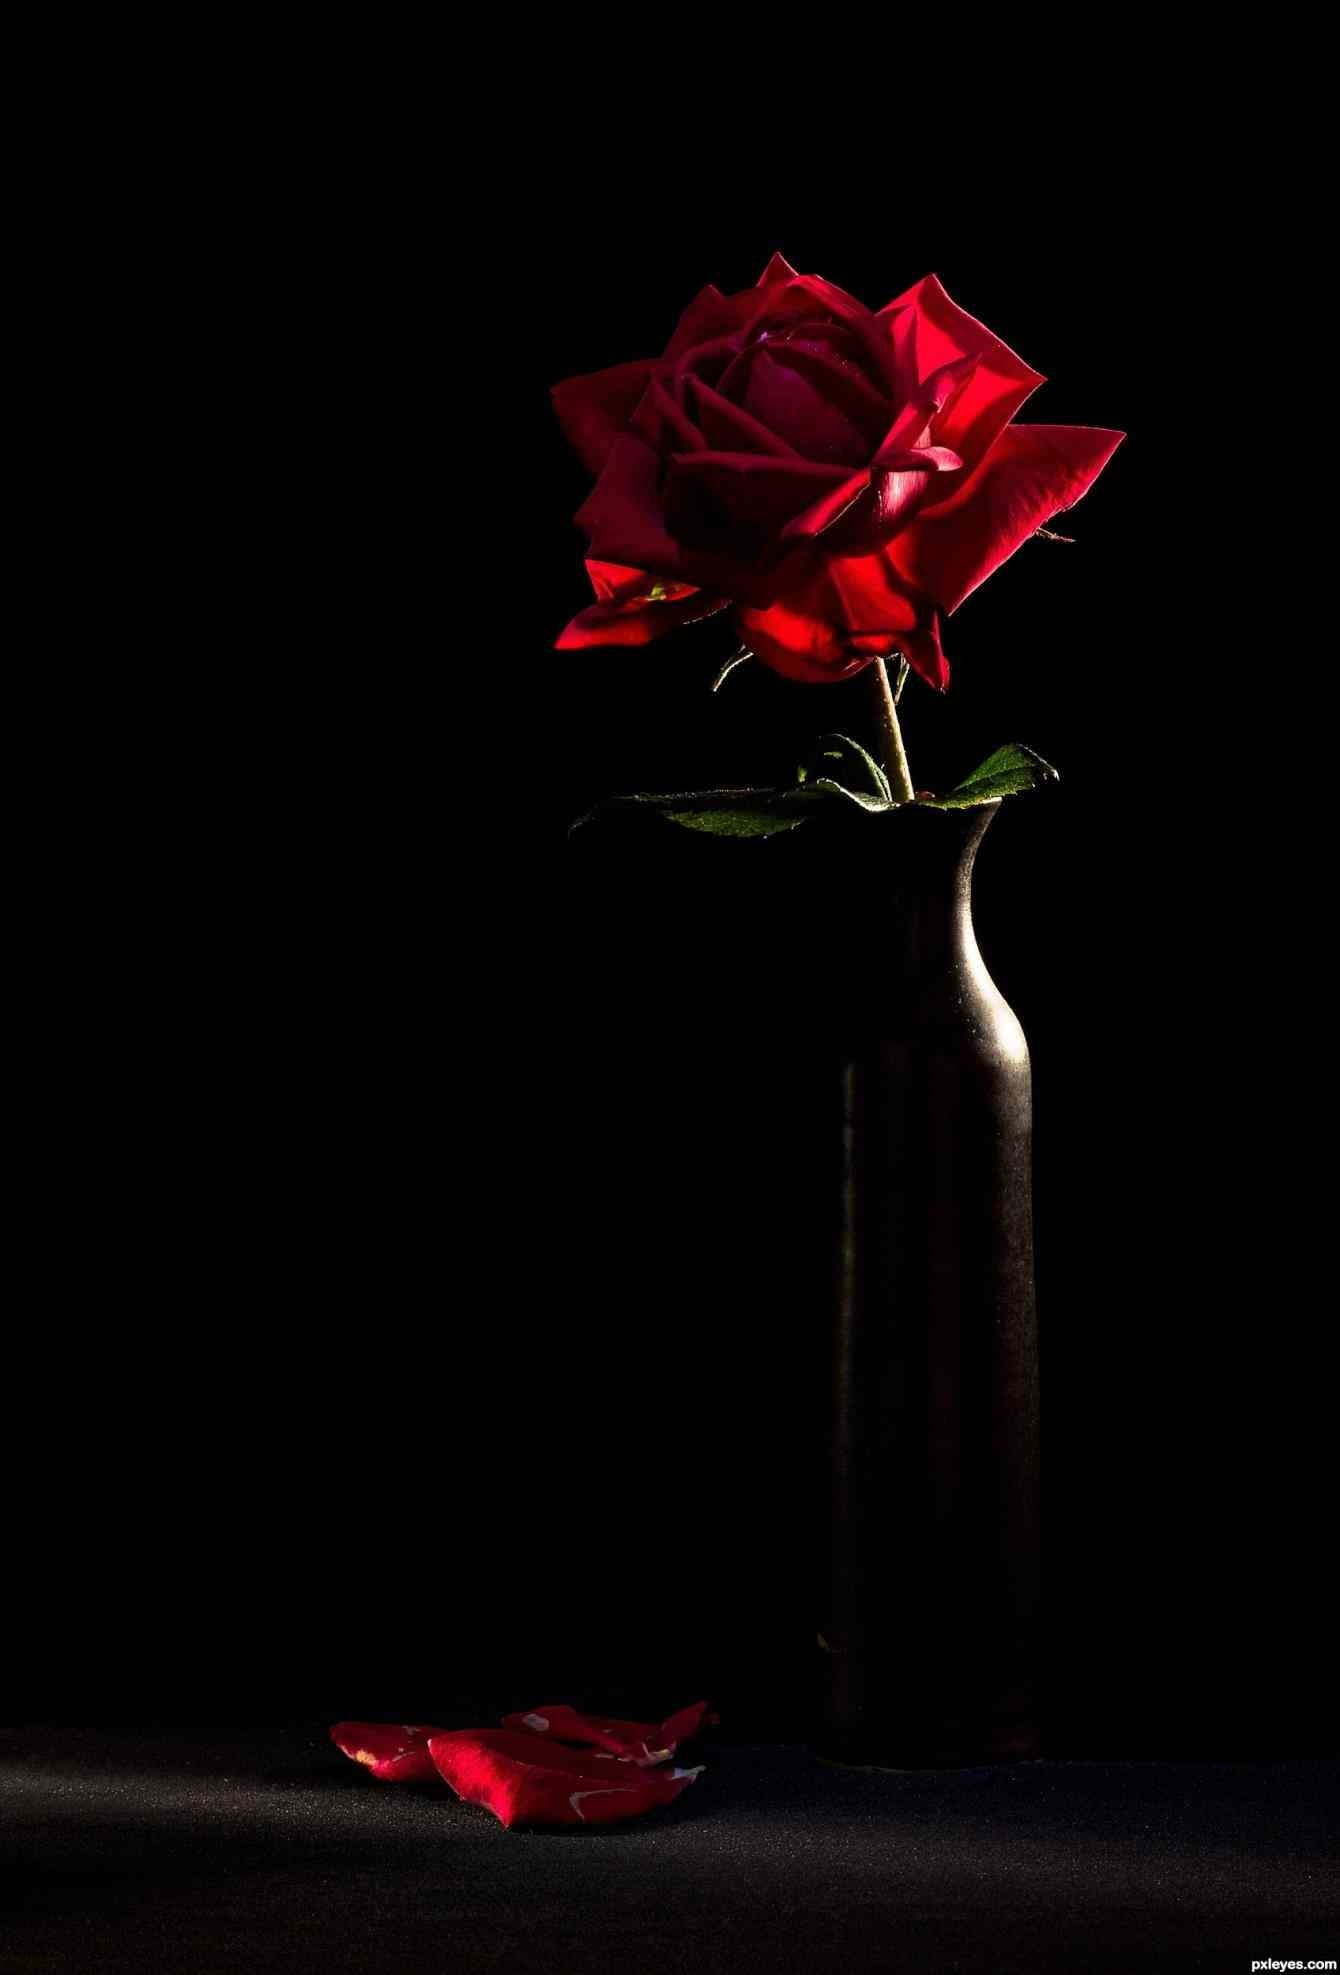 Red Rose Wallpaper Hd Iphone